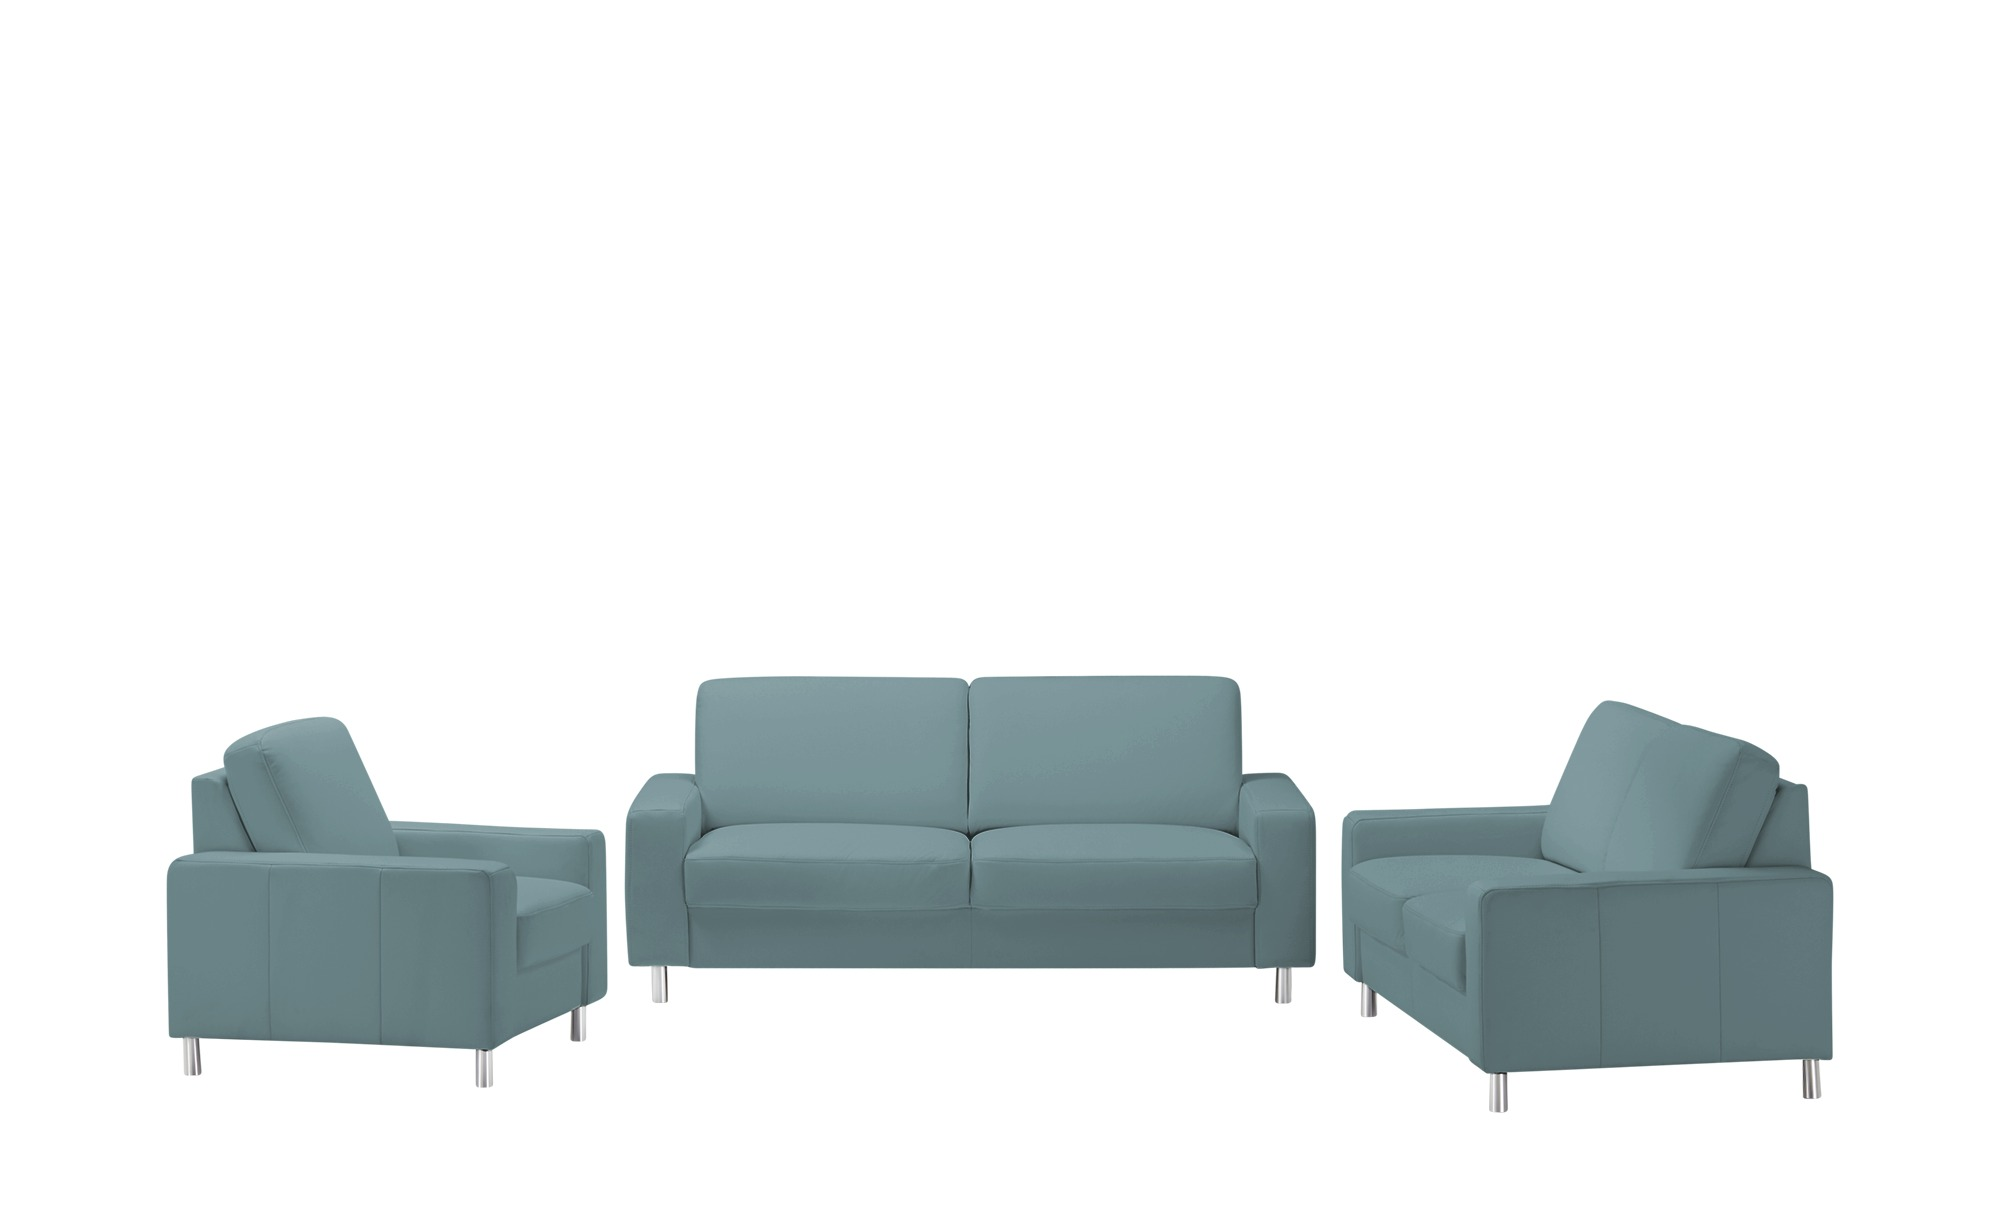 meinSofa Sitzgruppe  Byron ¦ grau Polstermöbel > Sofas > Sitzgruppen - Höffner